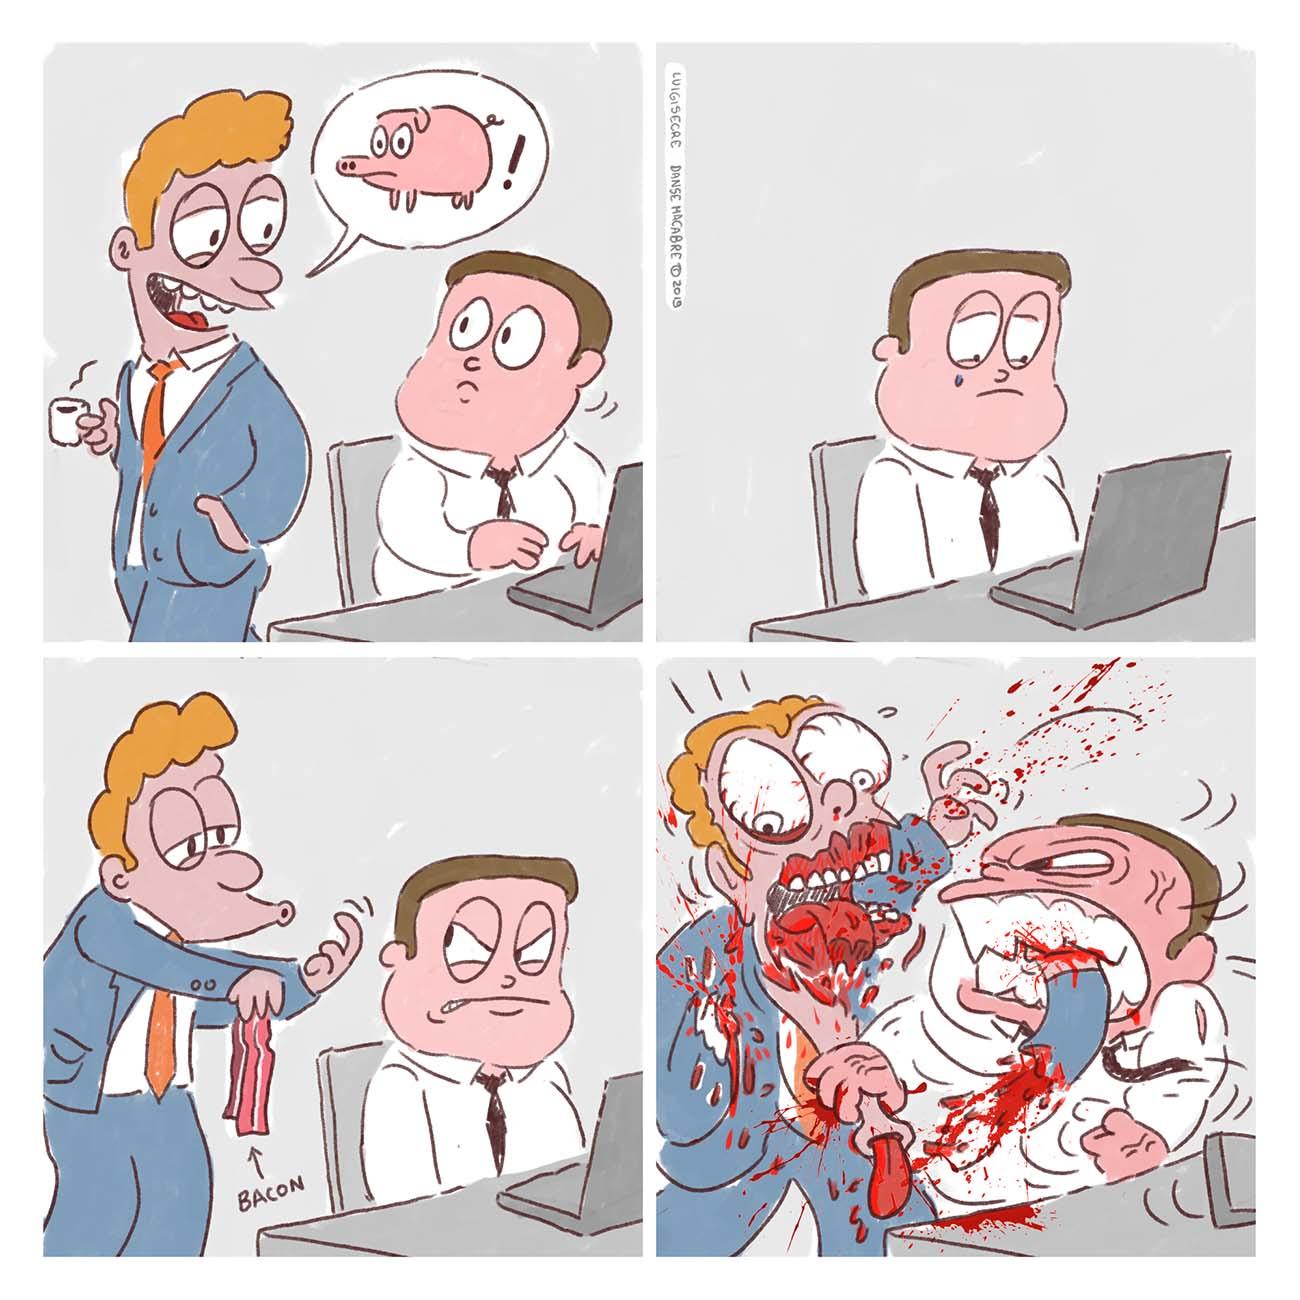 Contenuti_Low_Res_Luigi_Segre_Cartoons_2019_Danse_Macabre_18.jpg